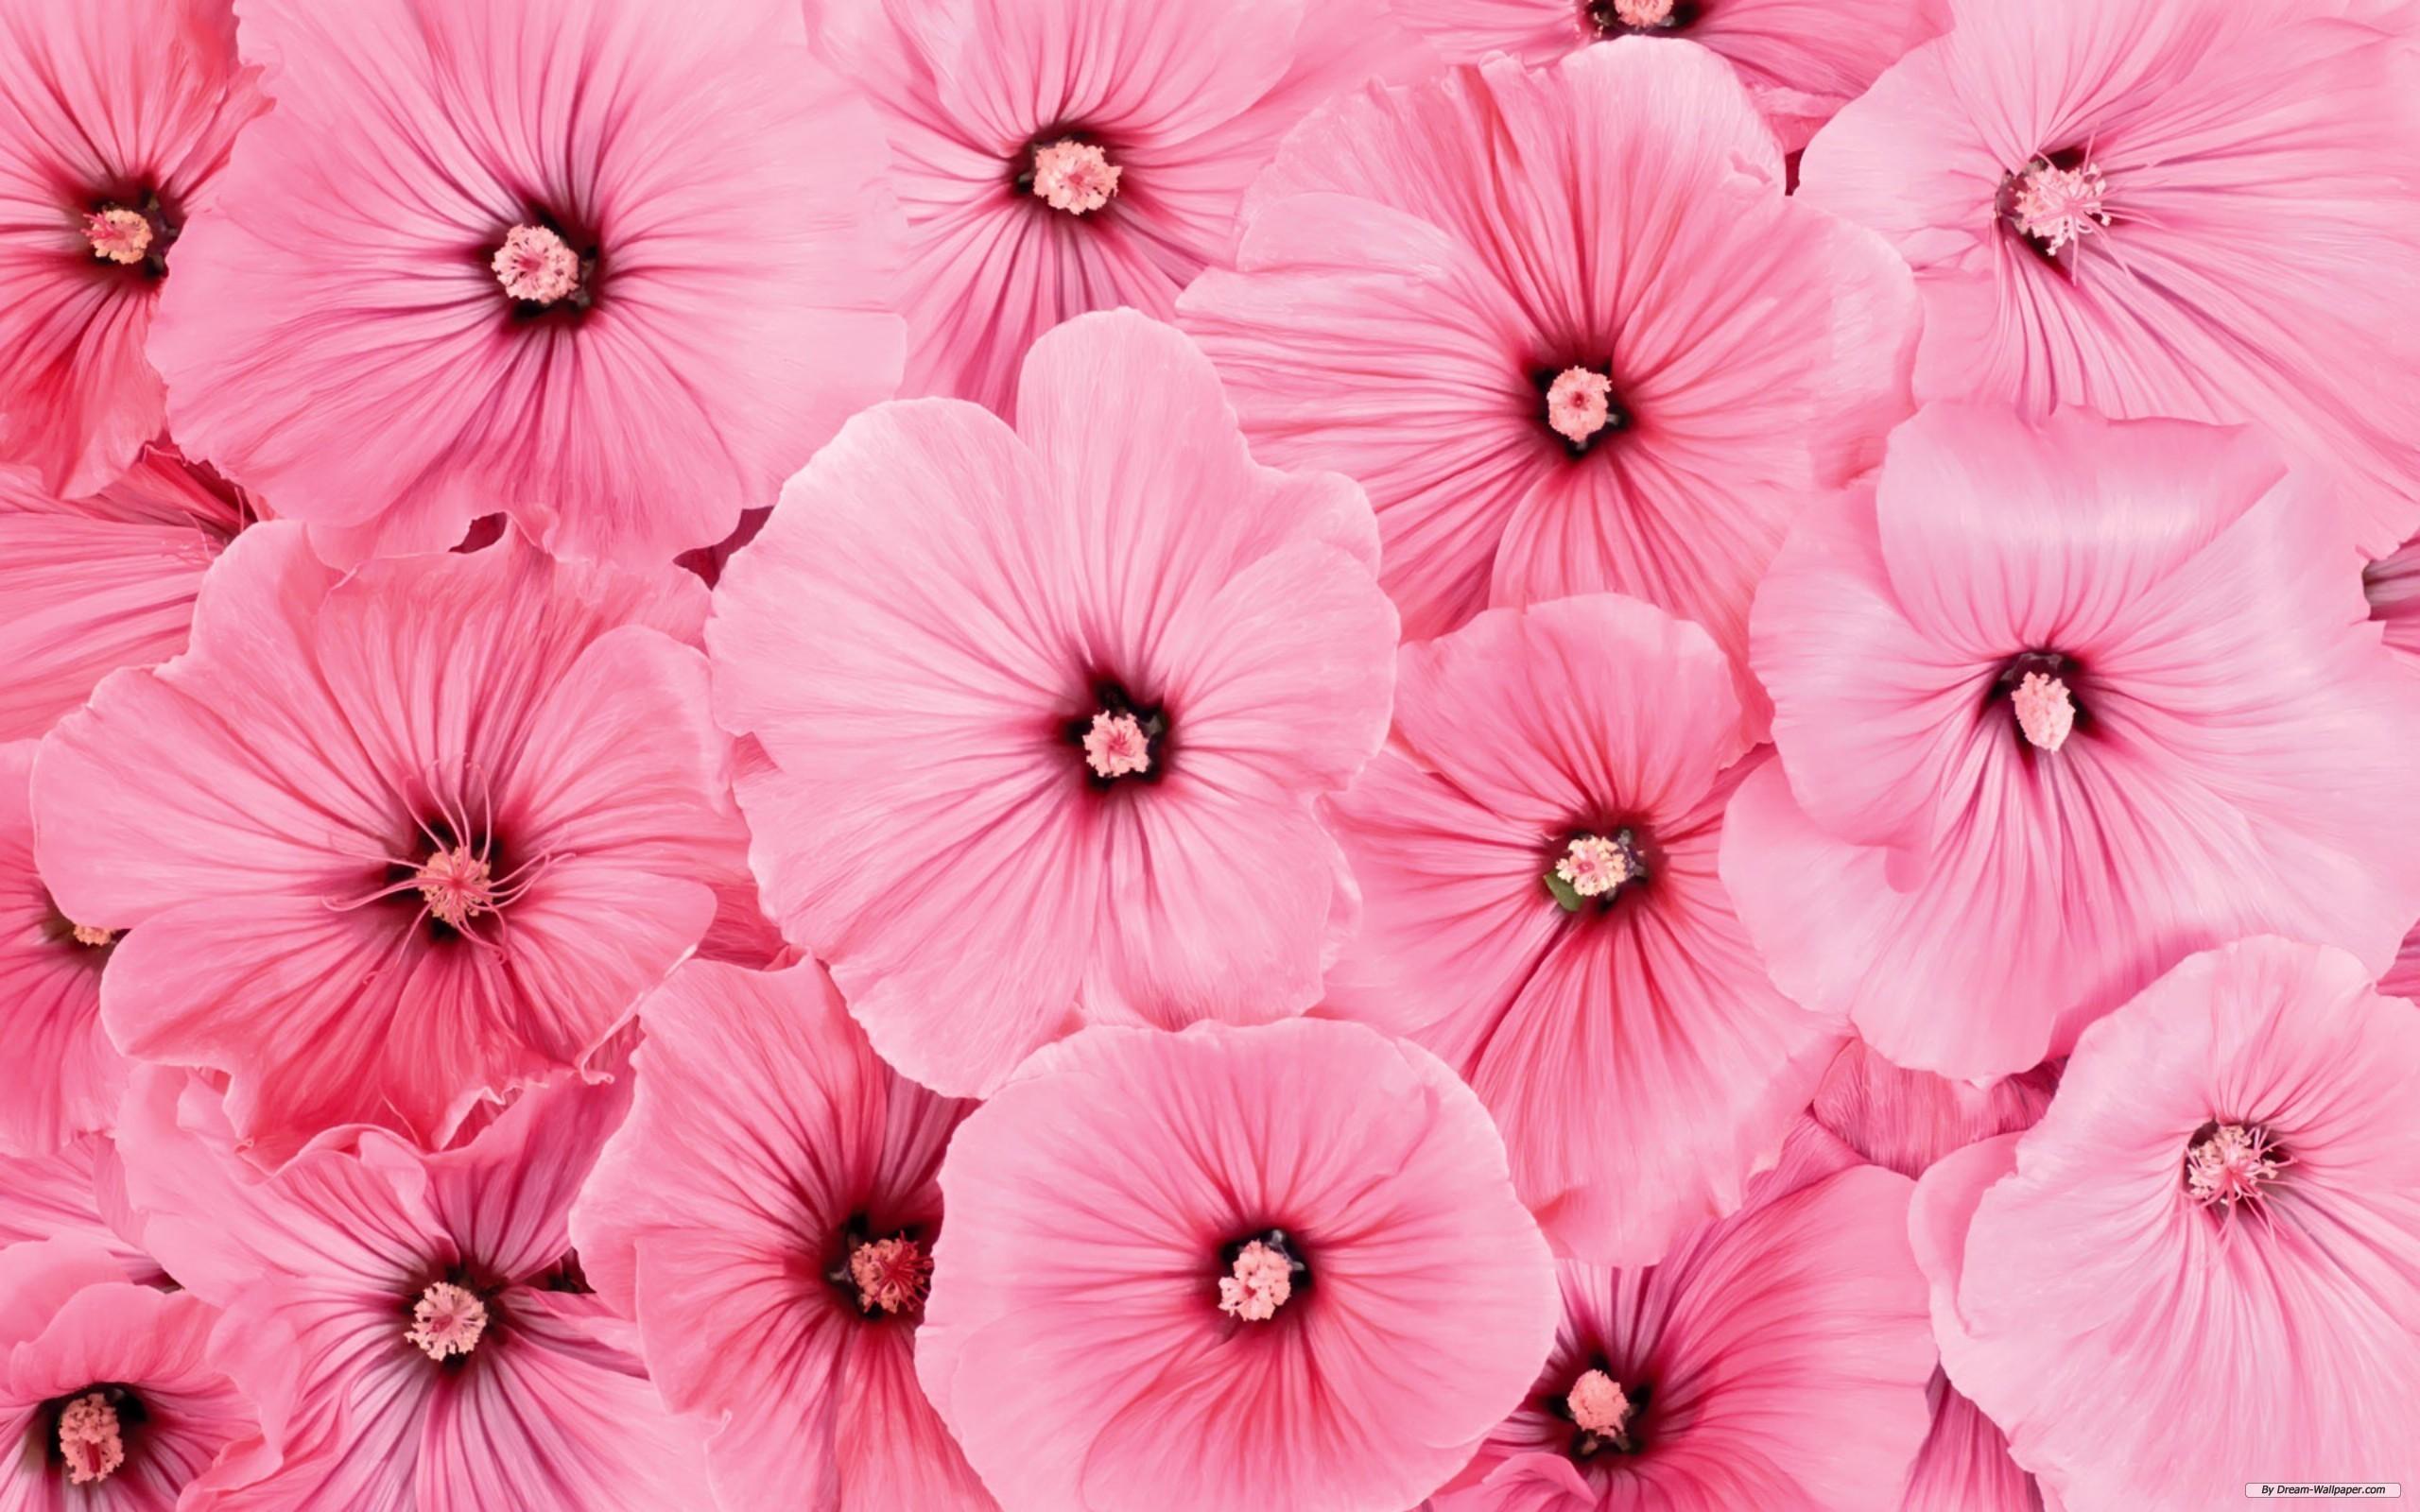 Pink hd wallpaper 81 images 1920x1200 pink flowers hd wallpapers free wallpaper download mightylinksfo